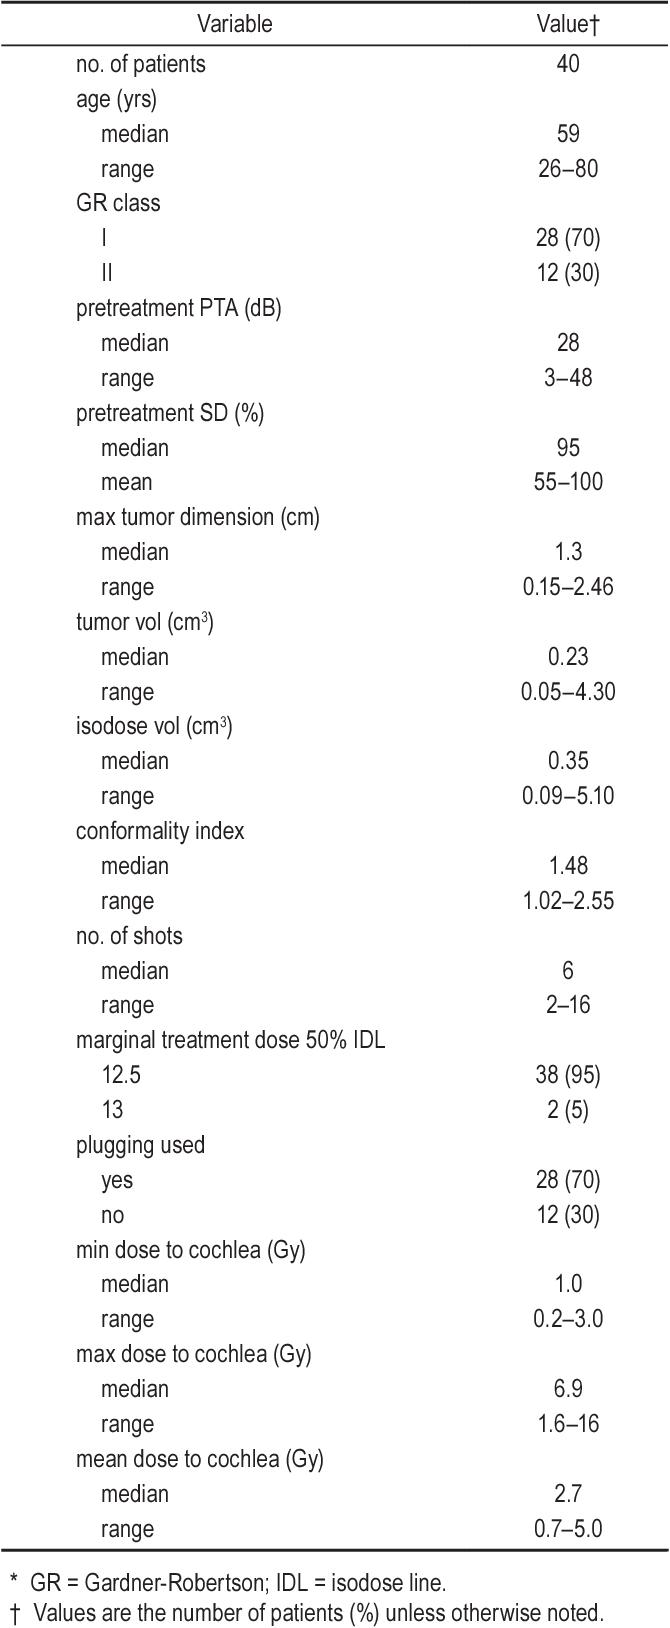 TABLE 2: Patient characteristics*